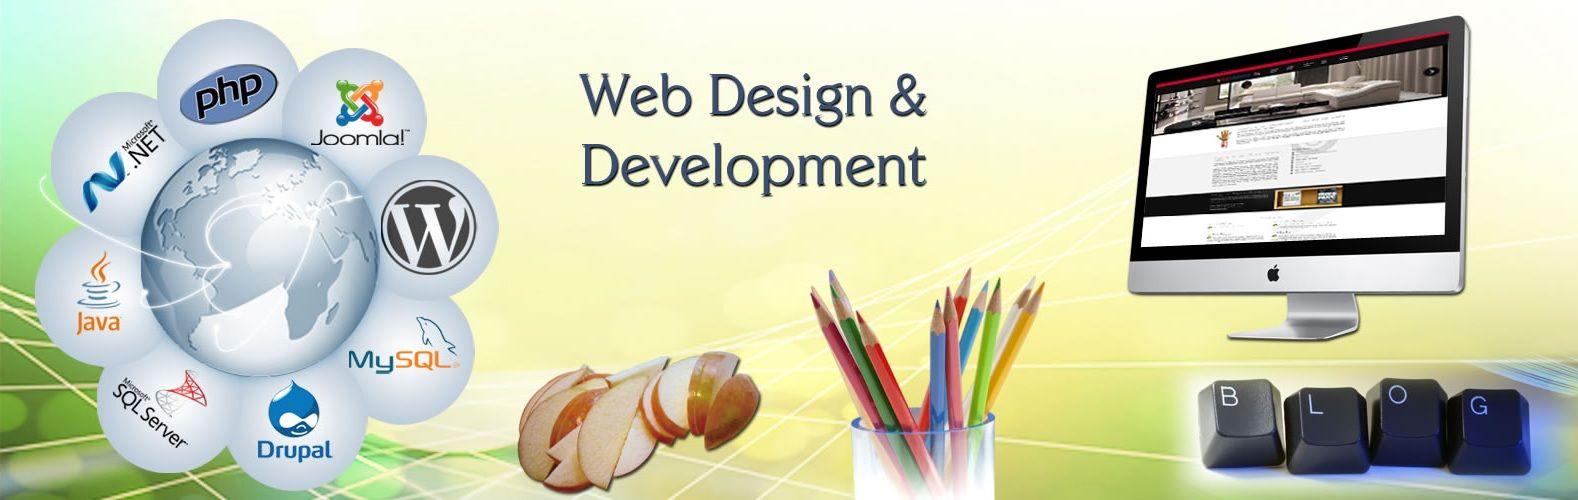 Pin By Ssi Biz On Web Design Web Design Company Website Development Company Web Design